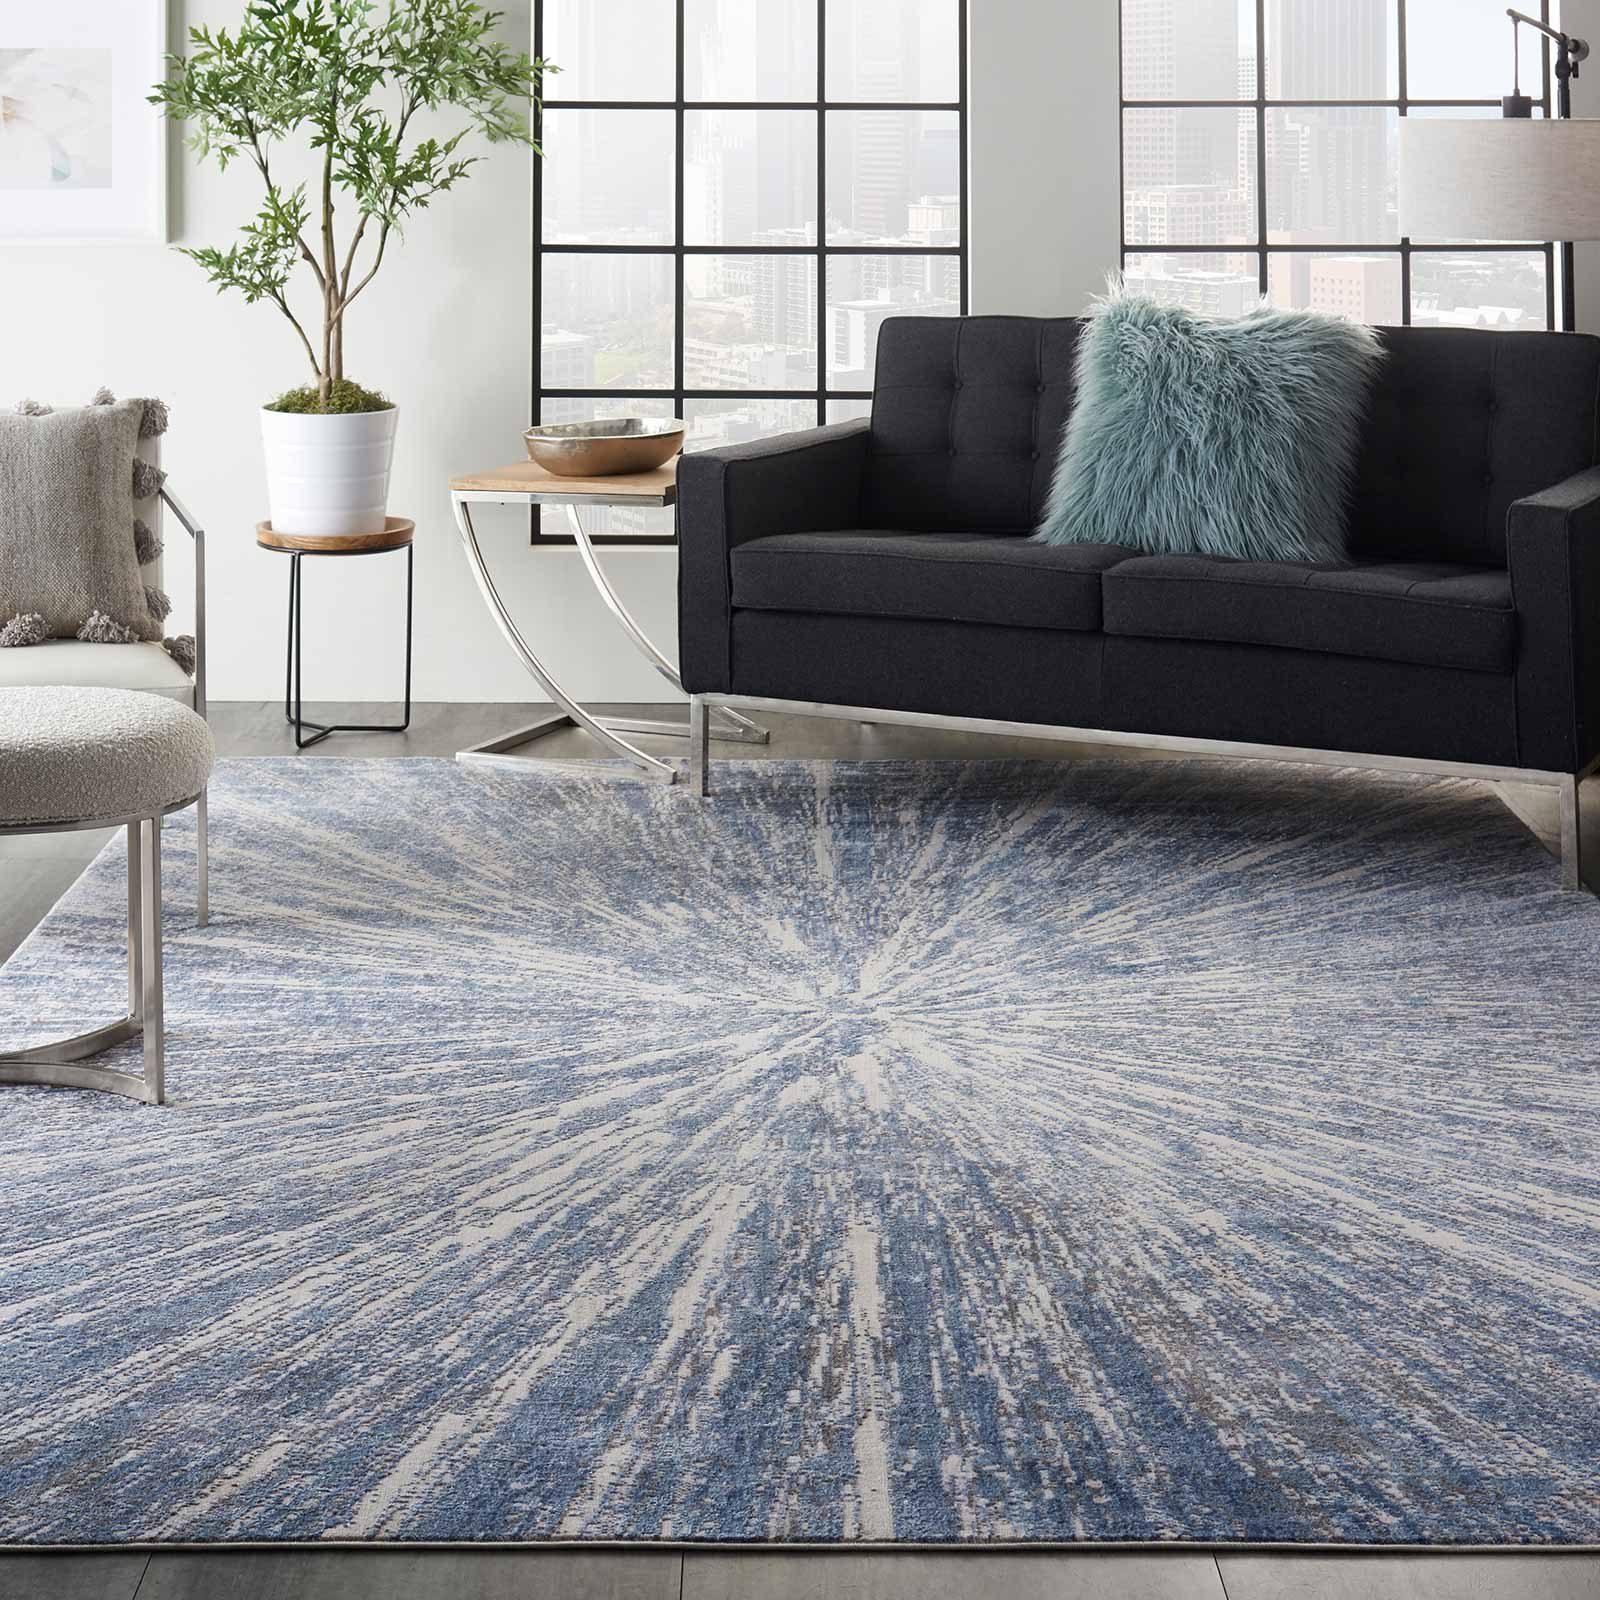 Nourison rug Silky Textures SLY05 BLUE GREY 8x11 099446710260 interior 1